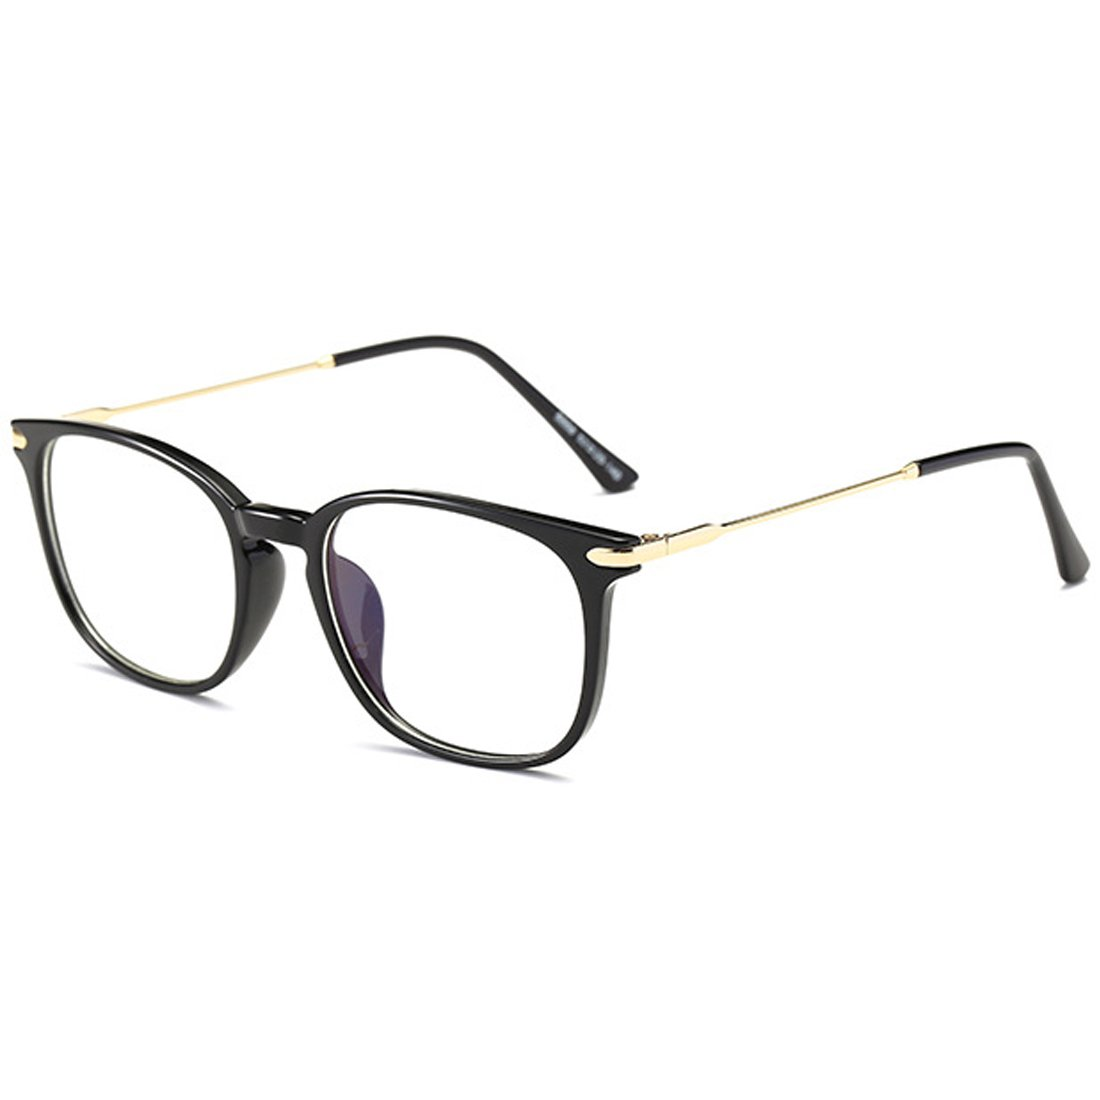 Rnow Vintage Anti-Reflective Anti-Glare Anti-Blue Rays Sunglasses Blue Tinted Lens Computer Gaming Eyeglasses